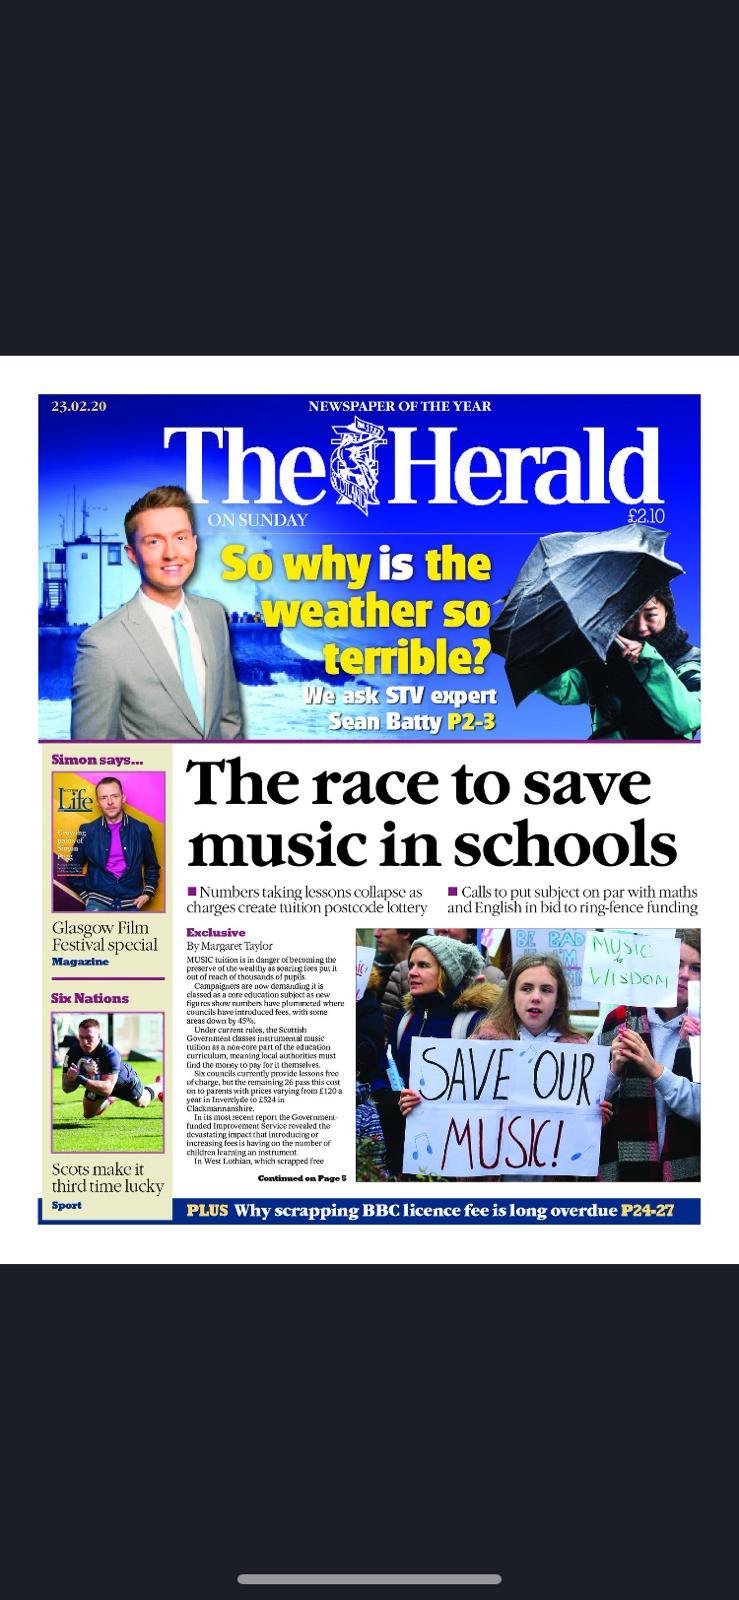 Music crisis is today's top Scottish headline